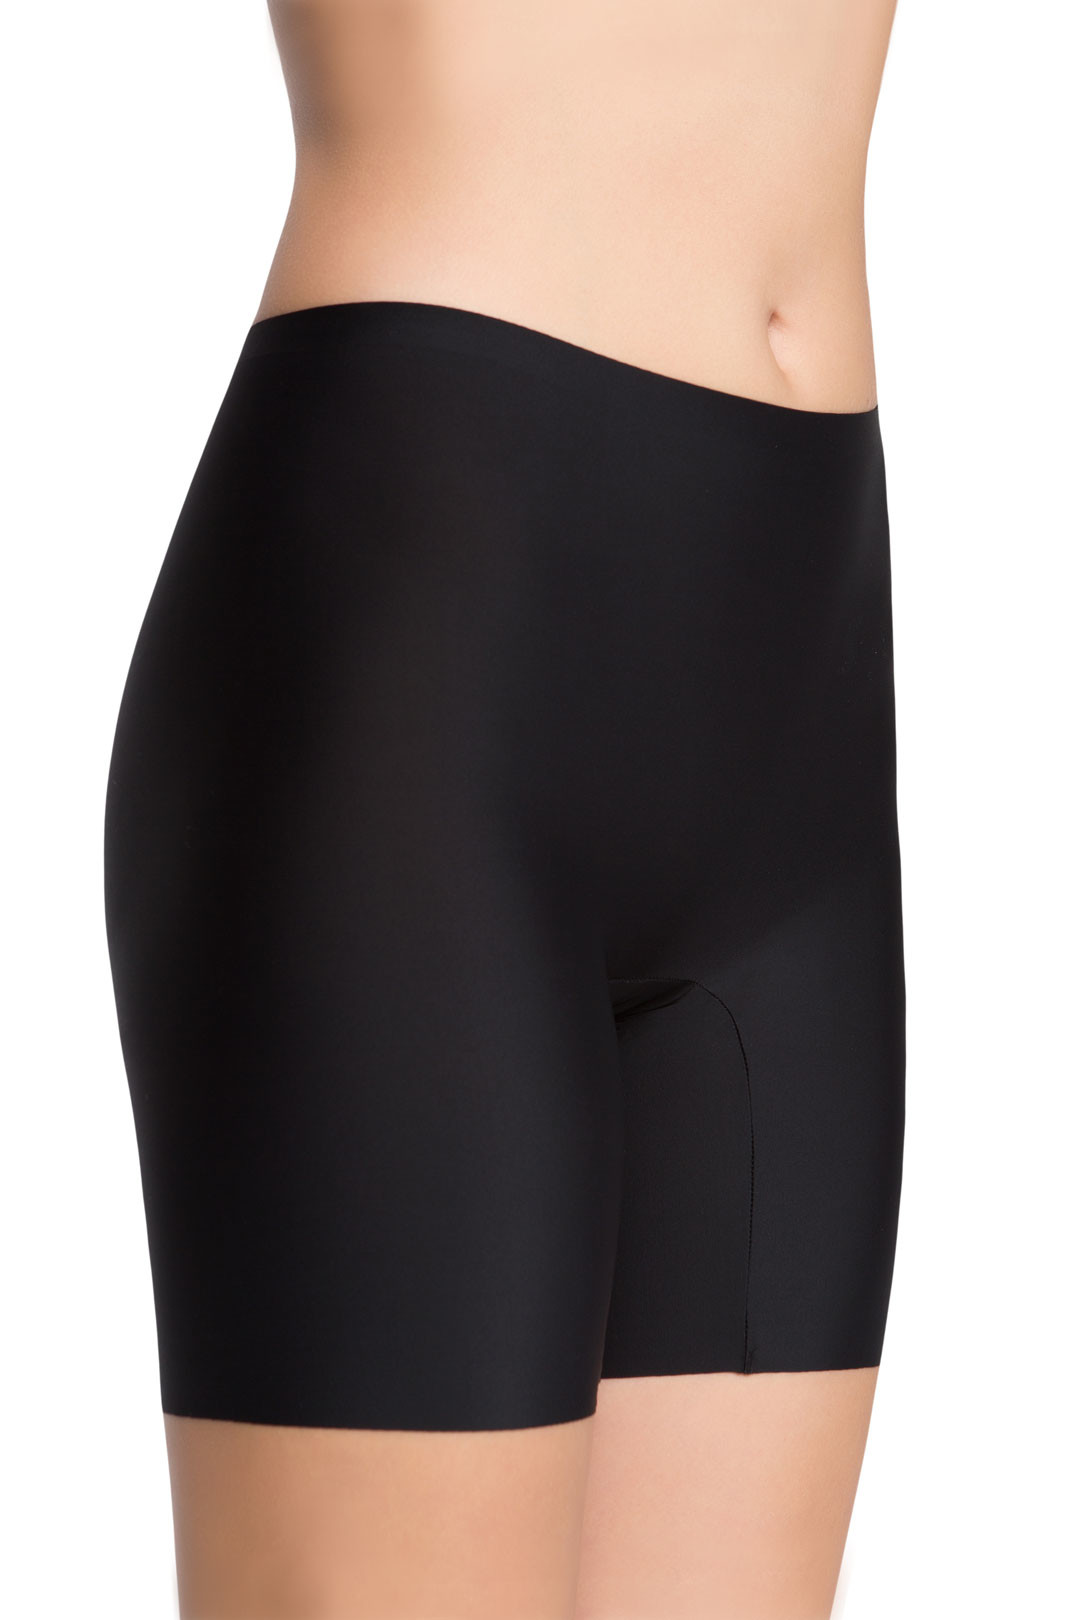 Hladké kalhotky s nohavičkou Invisible